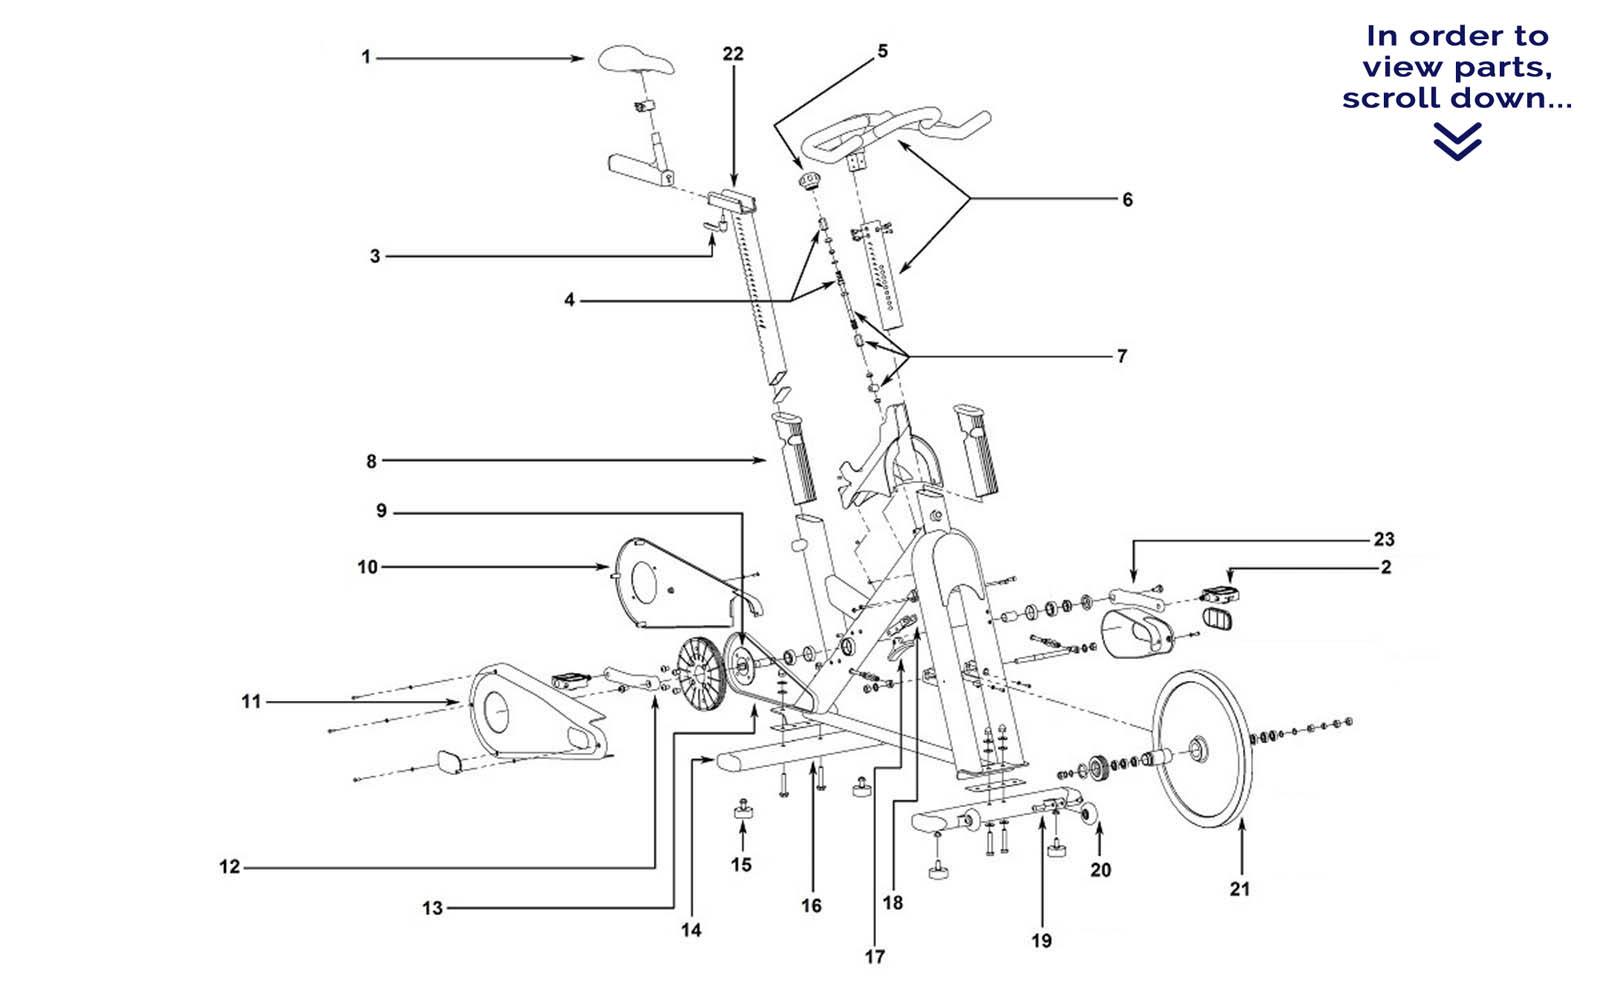 Matrix Tomahawk E Series Scroll Down To View Parts